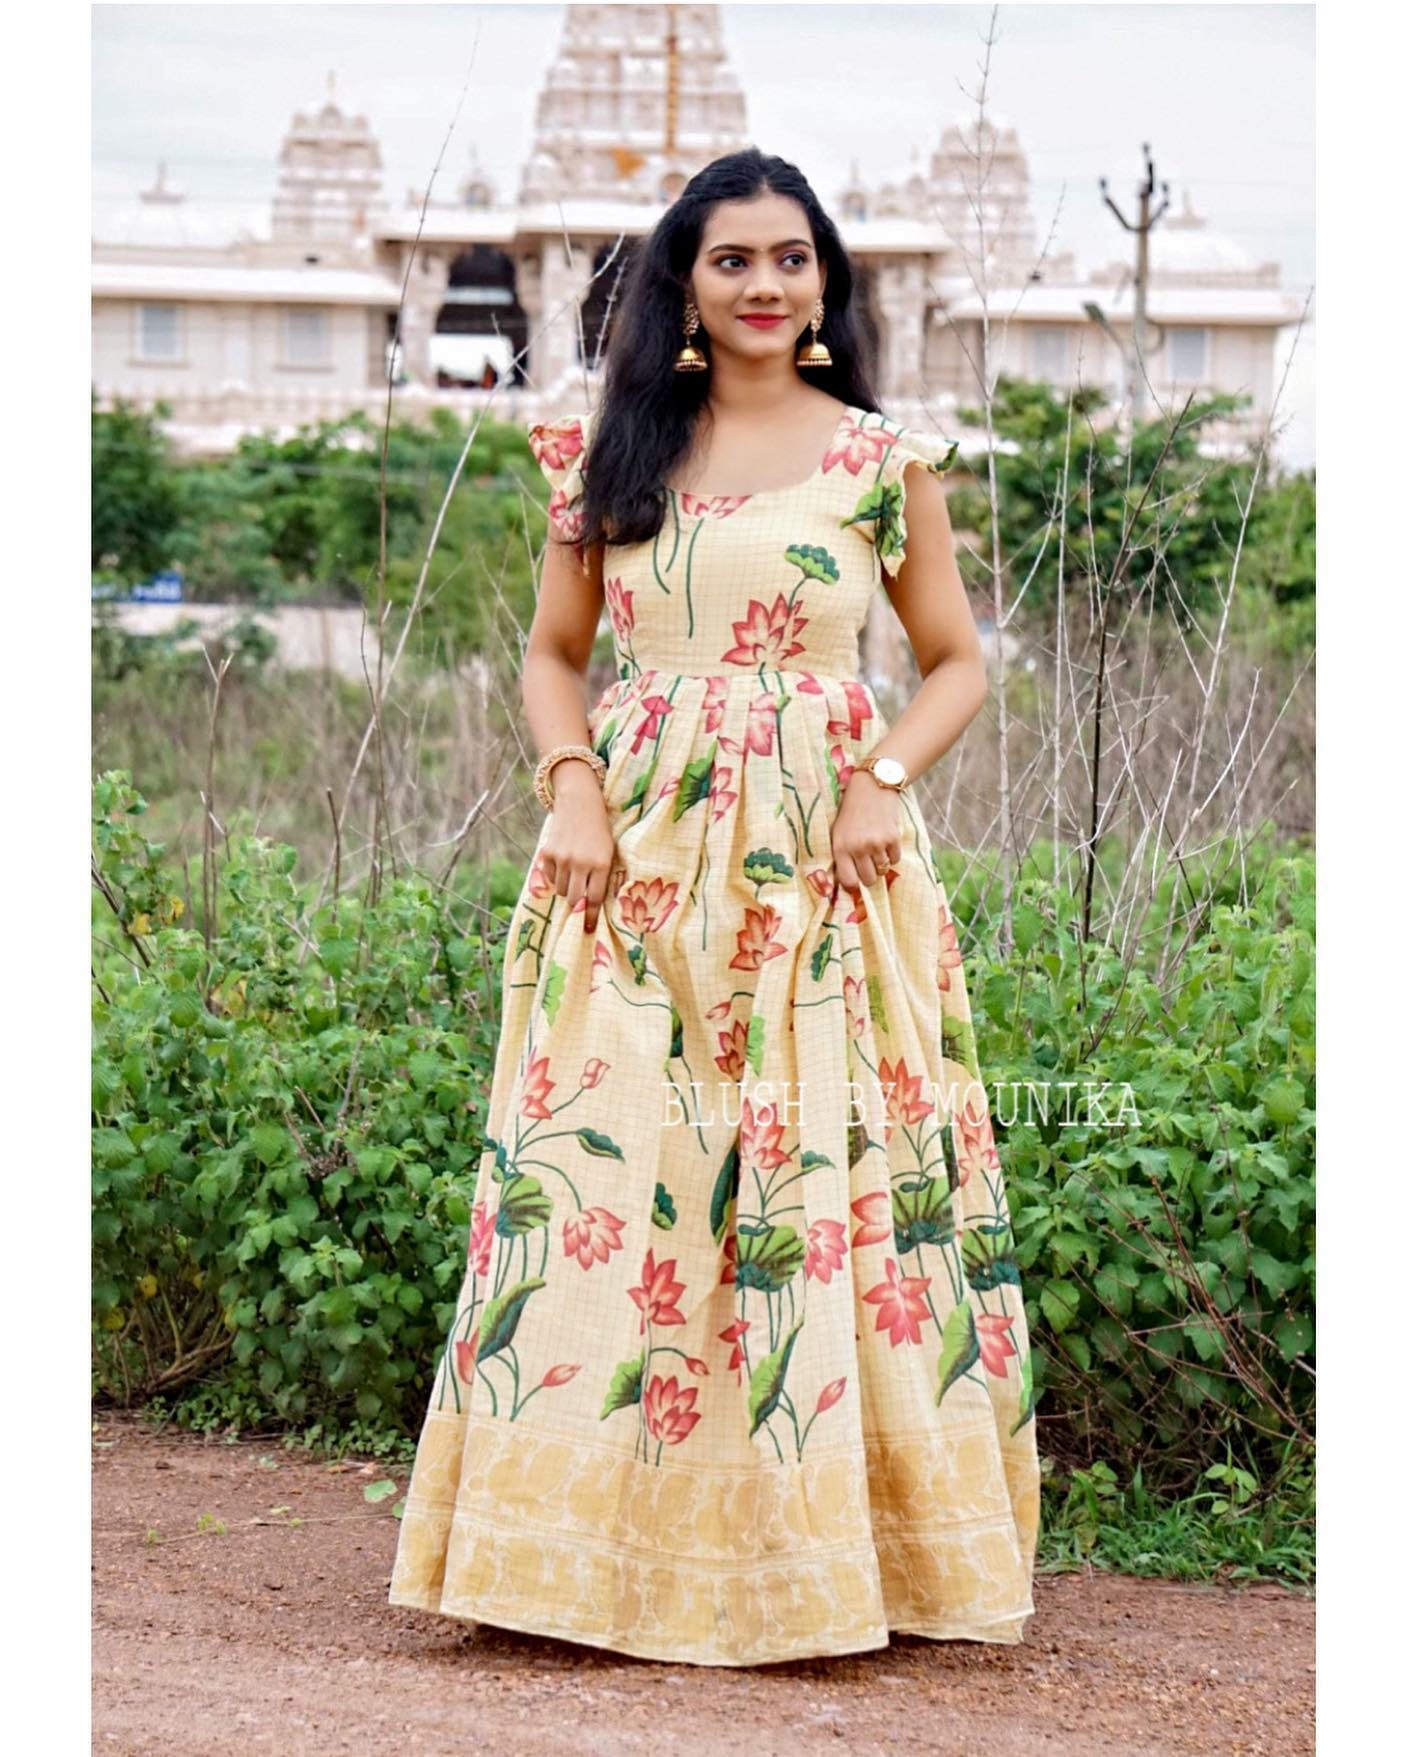 Chandanam. Price :  ₹4200/- Handloom Cotton Maxi Dress with Floral Print Zari checks and Zari border. Sleeves can be customized. 2021-07-12